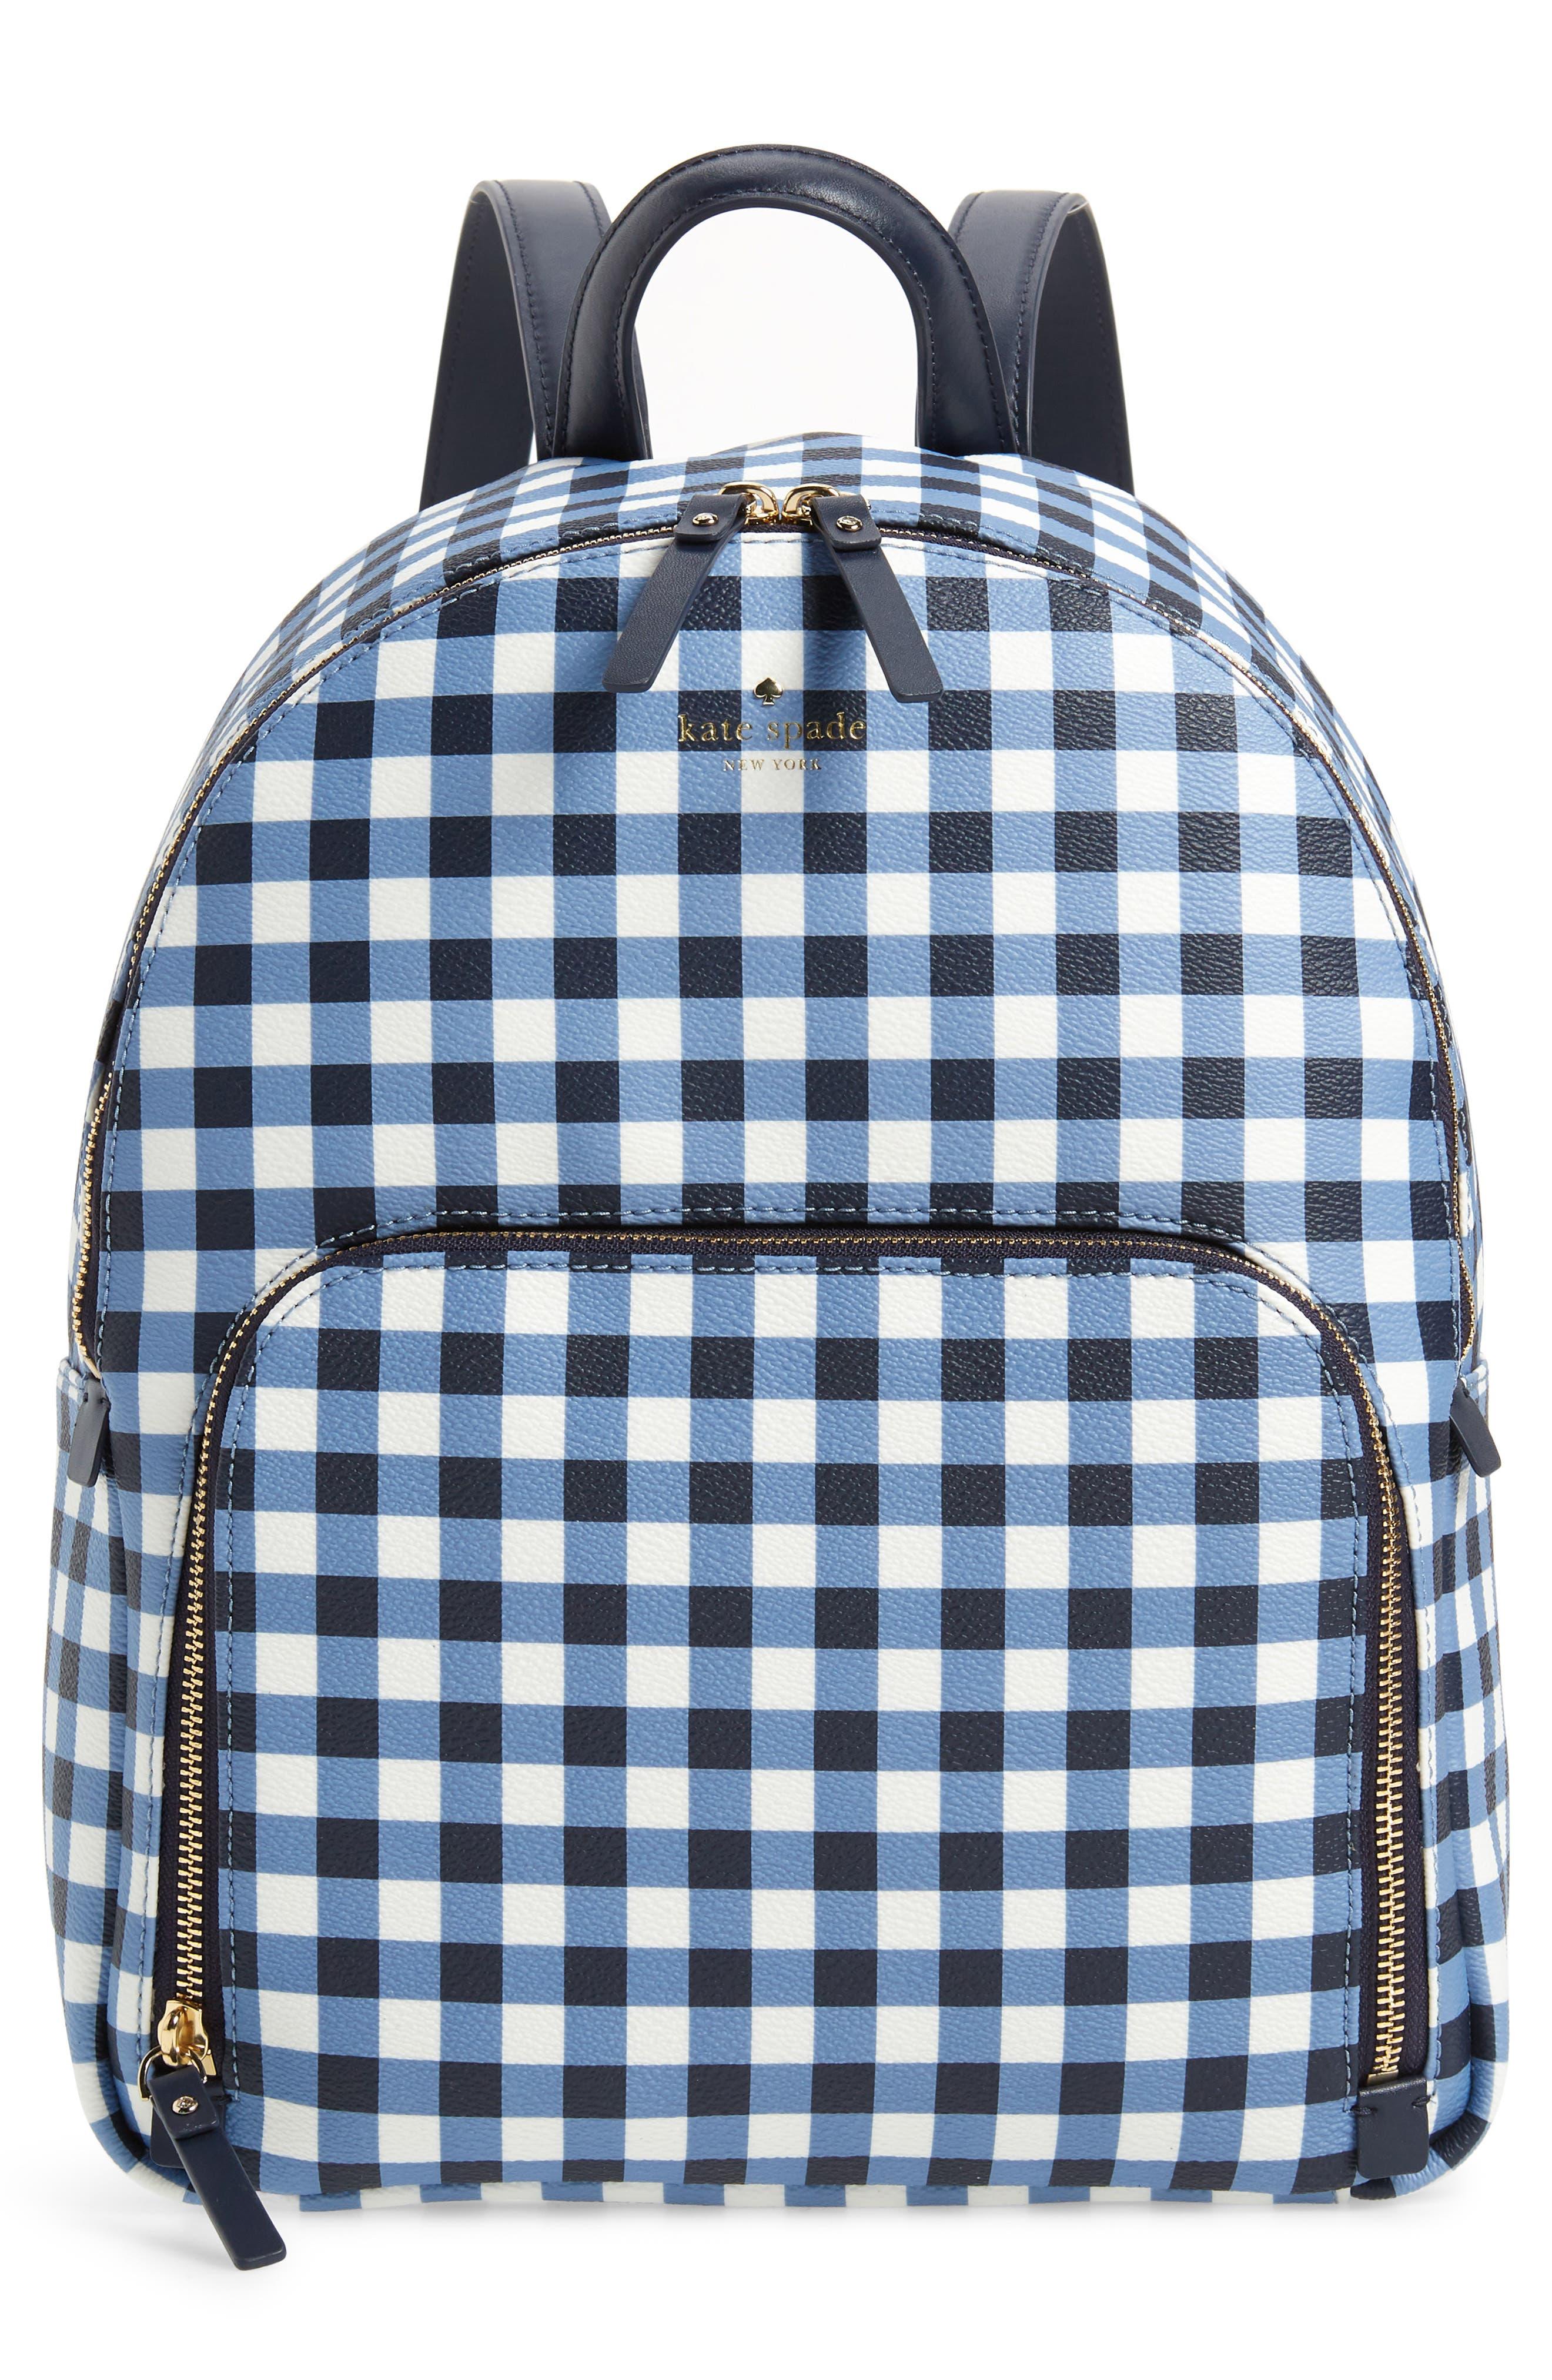 hyde lane hartley gingham backpack,                             Main thumbnail 1, color,                             Navy/ White